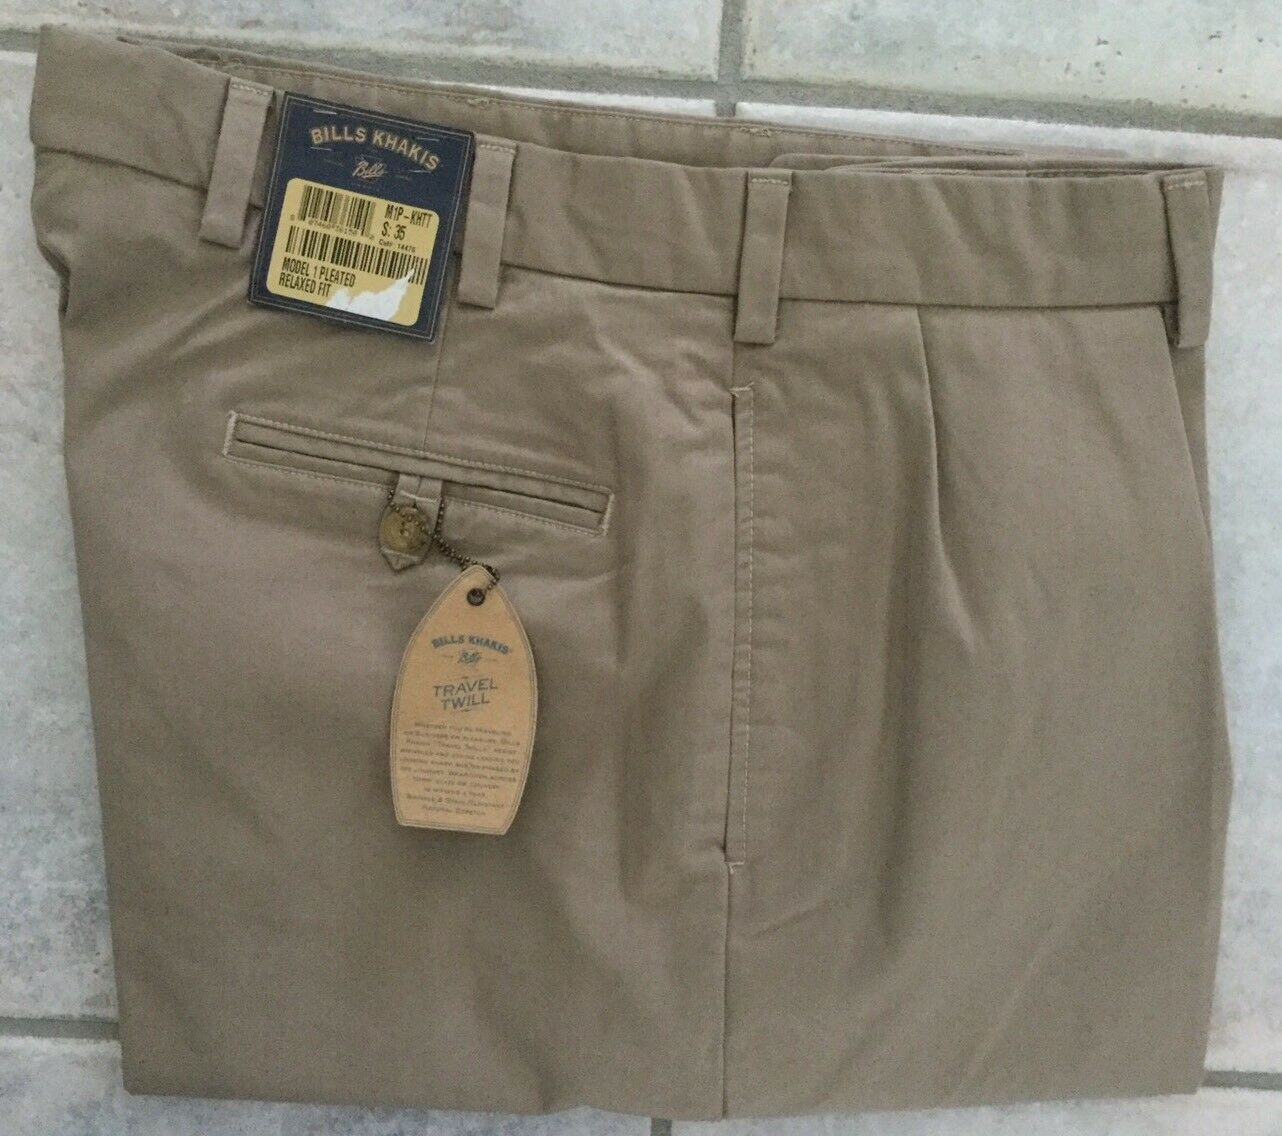 BRAND NEW-Bills khakis M1P-KHTT Size 35 KHAKI TRAVEL TWILL PLEATED